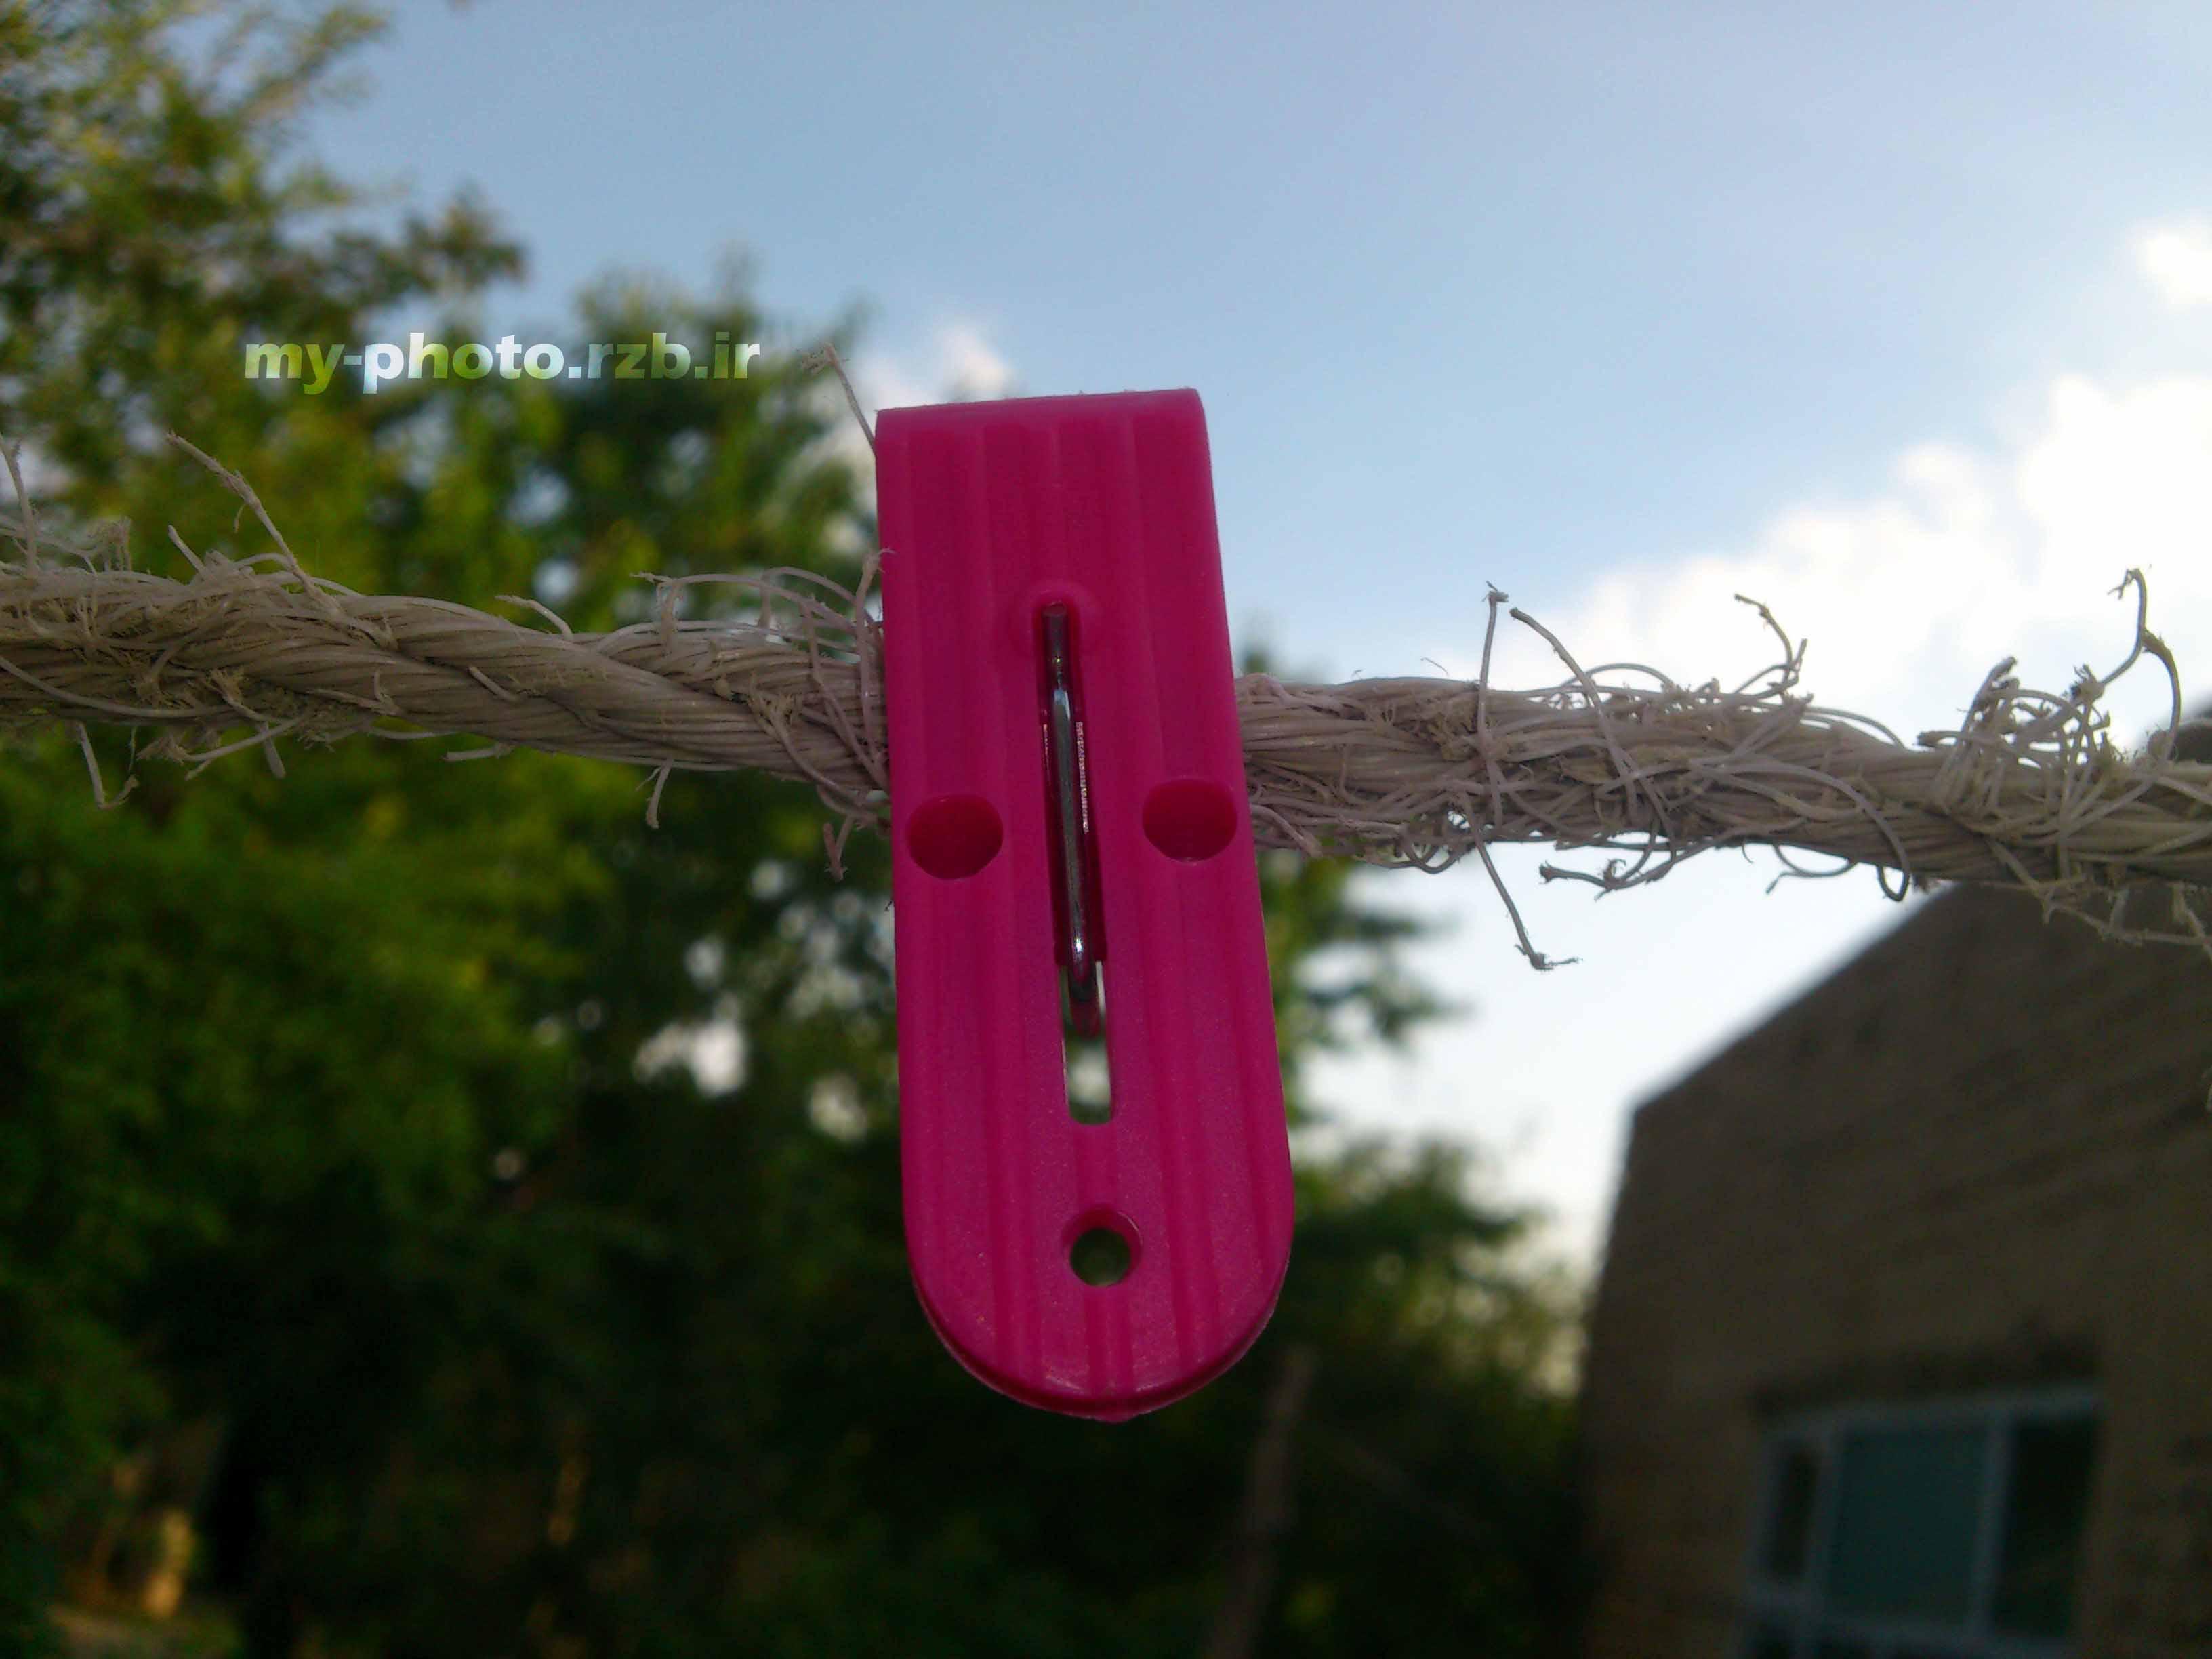 عکس 5:«گیره و طناب»